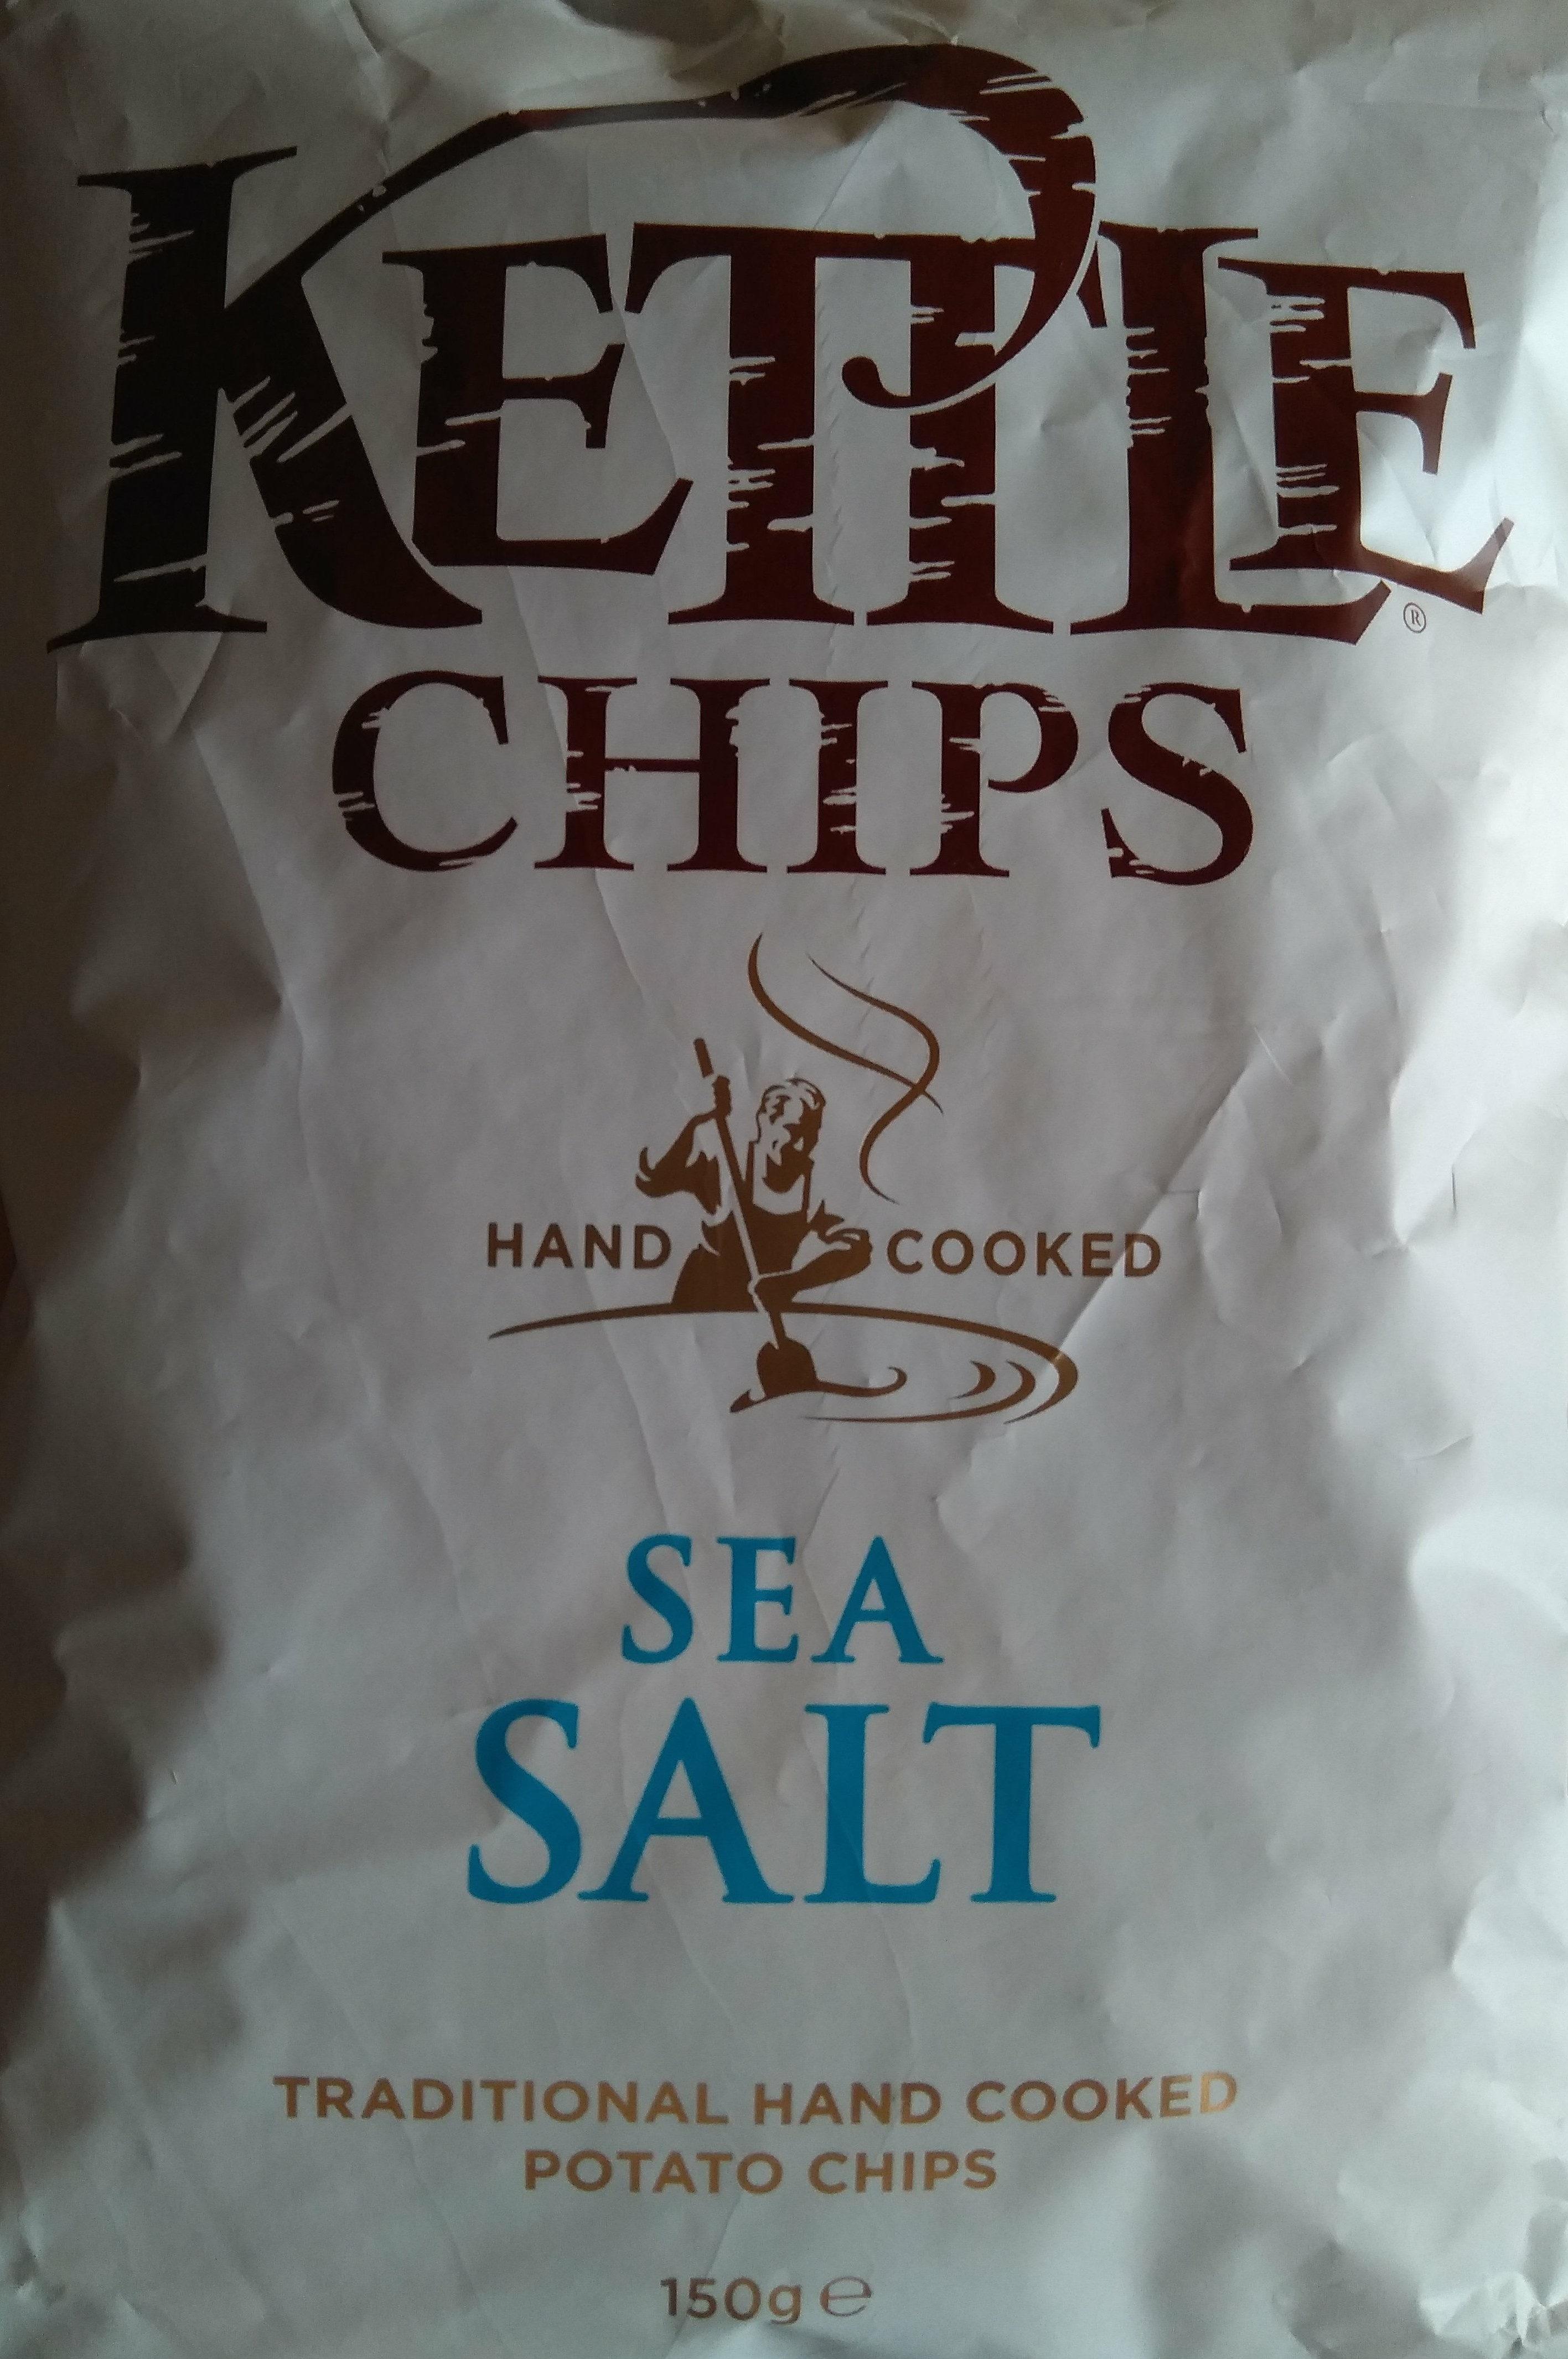 Patatas fritas con sal marina bolsa 150 g - Produkt - de